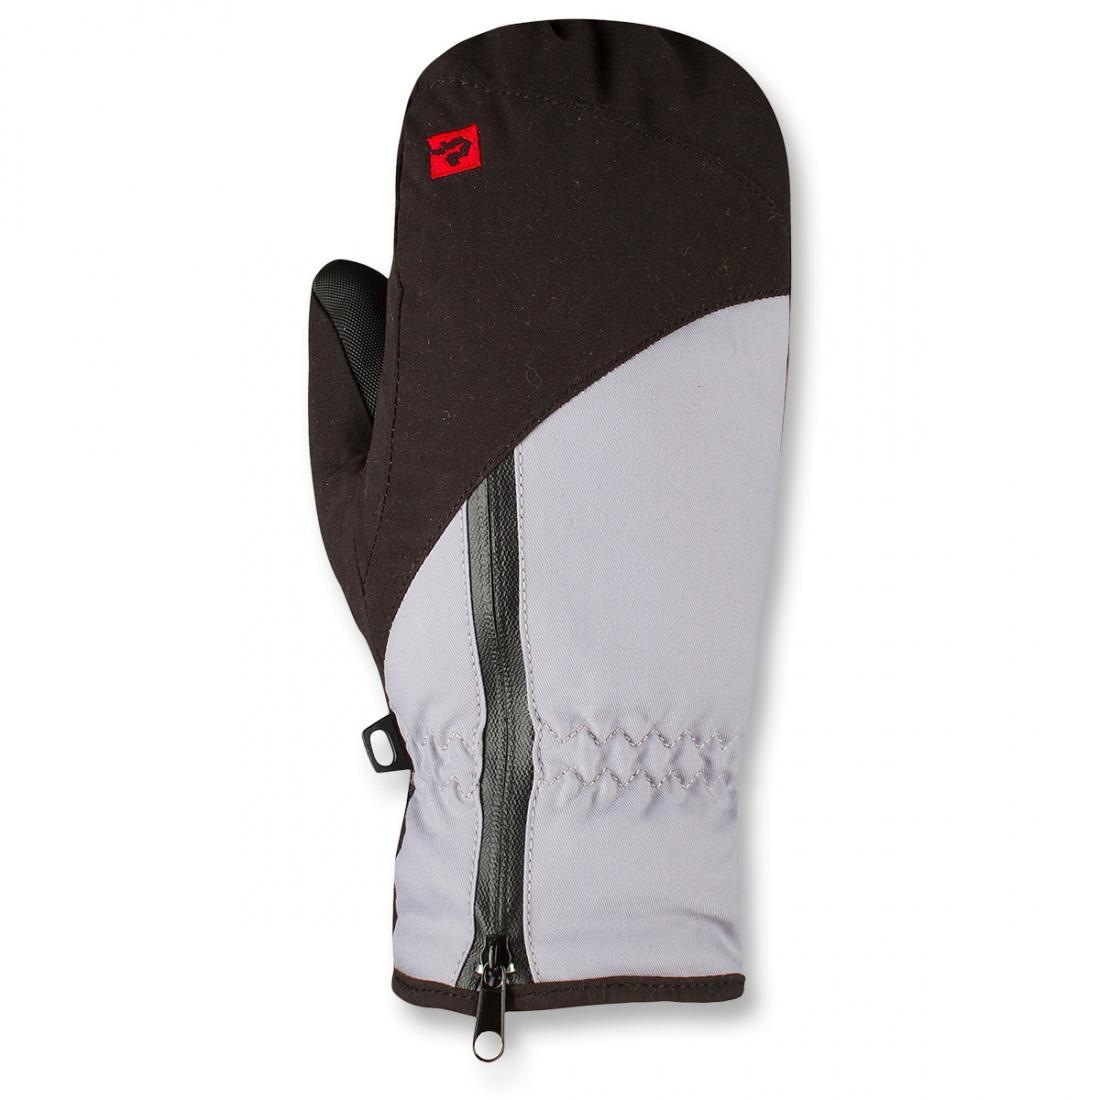 Рукавицы утепленные Traverse II ПодростковыеВарежки<br><br> Прогулочные утепленные рукавицы с ярким дизайном.<br><br><br><br><br><br>Материал – 50% Polyester, 50% Nylon, 156 g/sqm.<br>Усиление – 80% Polyvinyl Chloride, 20% Polyester, 690 g/sqm.<br>Утеплитель – Omnitherm® Classic...<br><br>Цвет: Серый<br>Размер: L